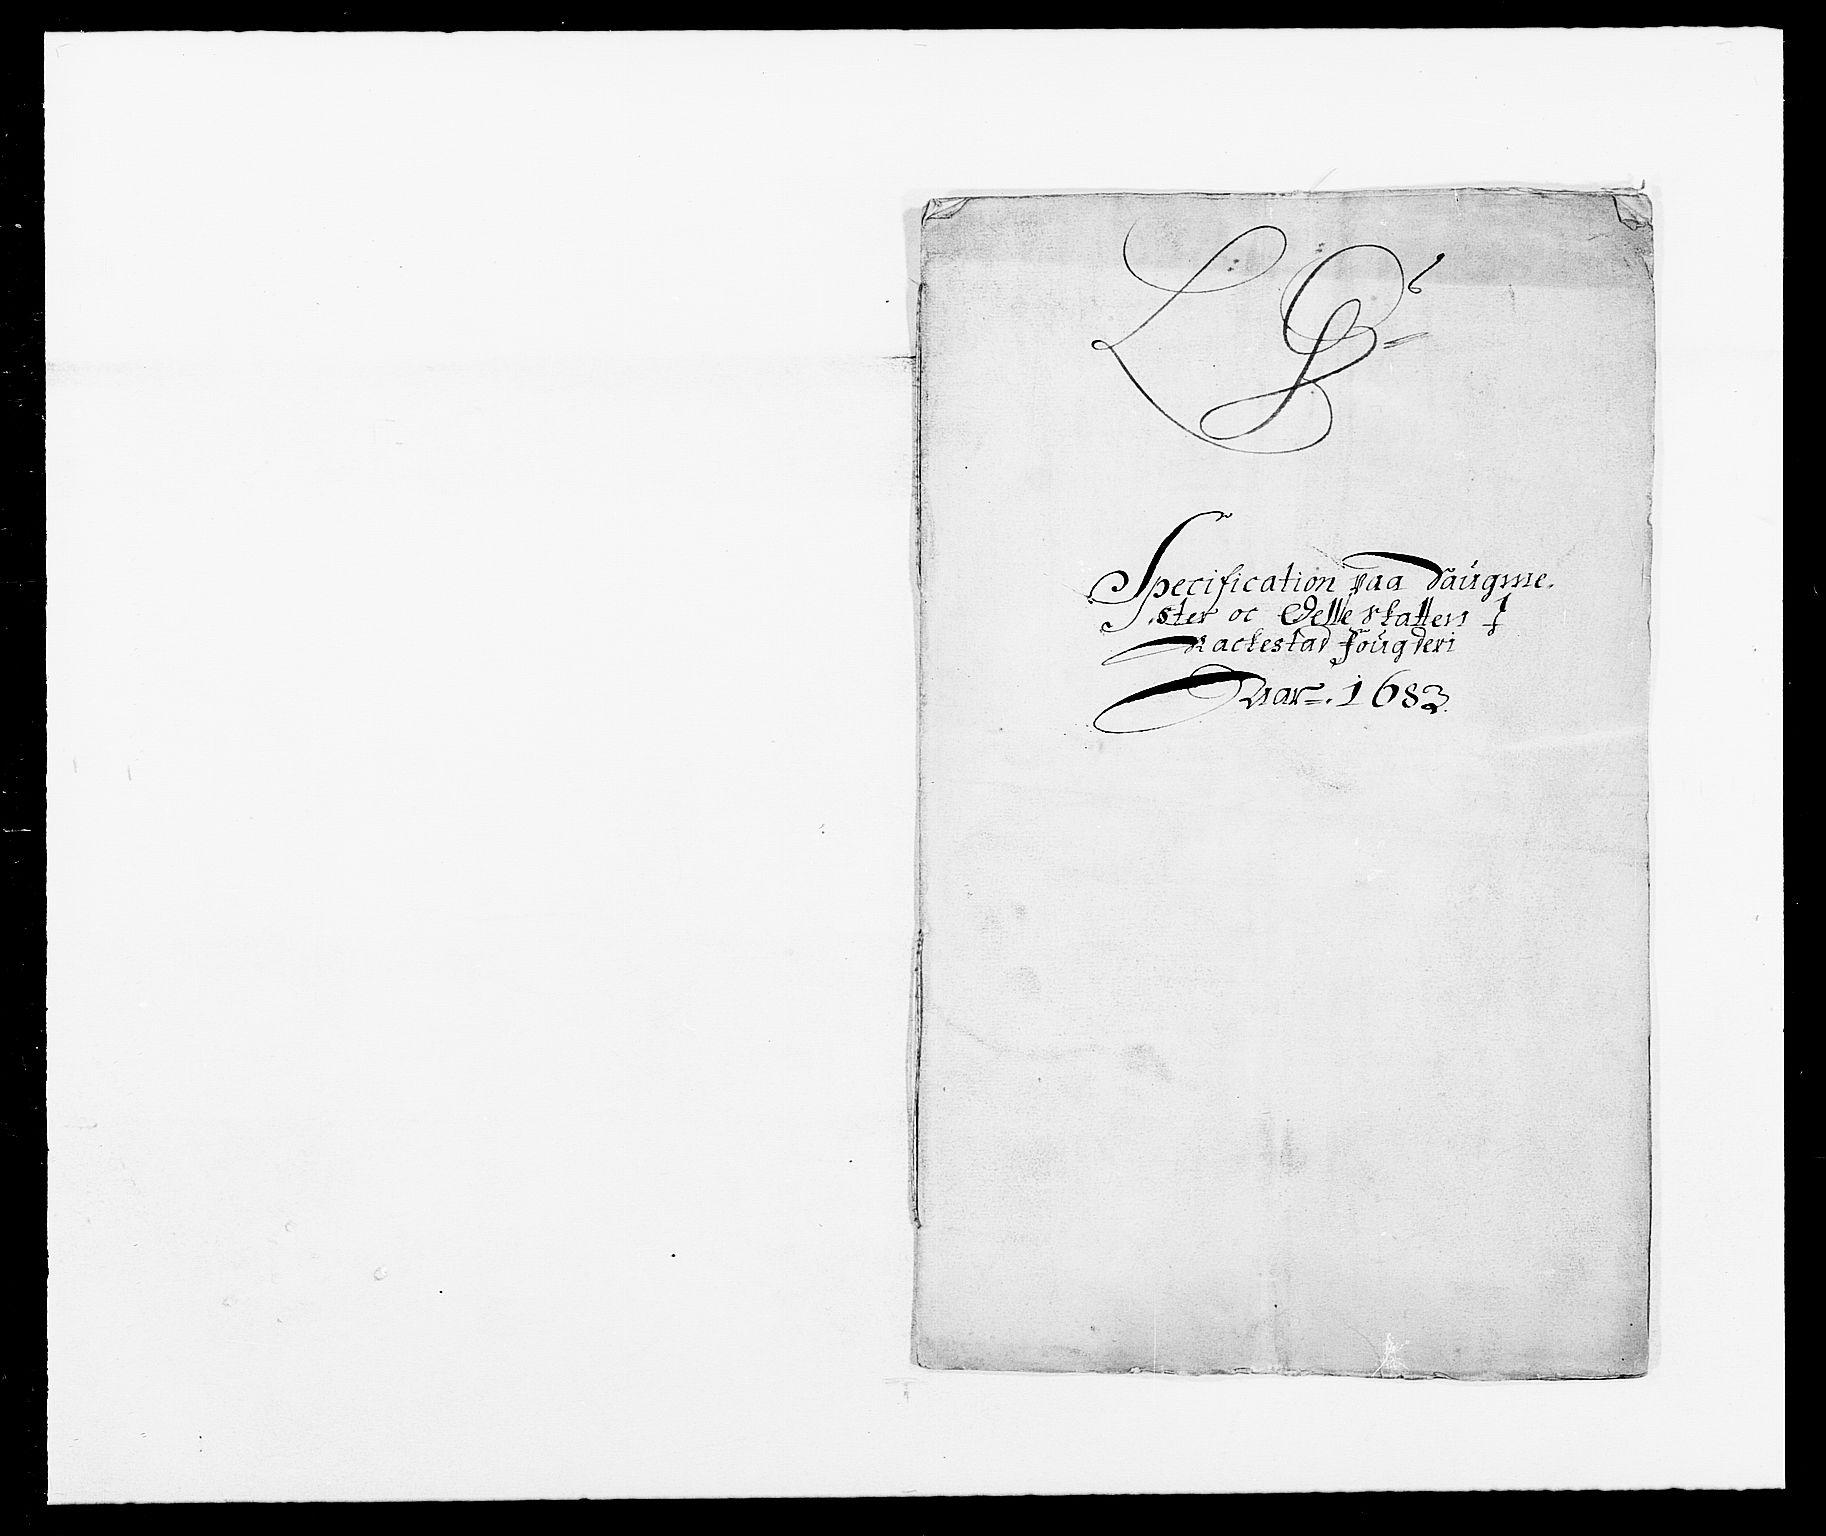 RA, Rentekammeret inntil 1814, Reviderte regnskaper, Fogderegnskap, R05/L0274: Fogderegnskap Rakkestad, 1683-1684, s. 161